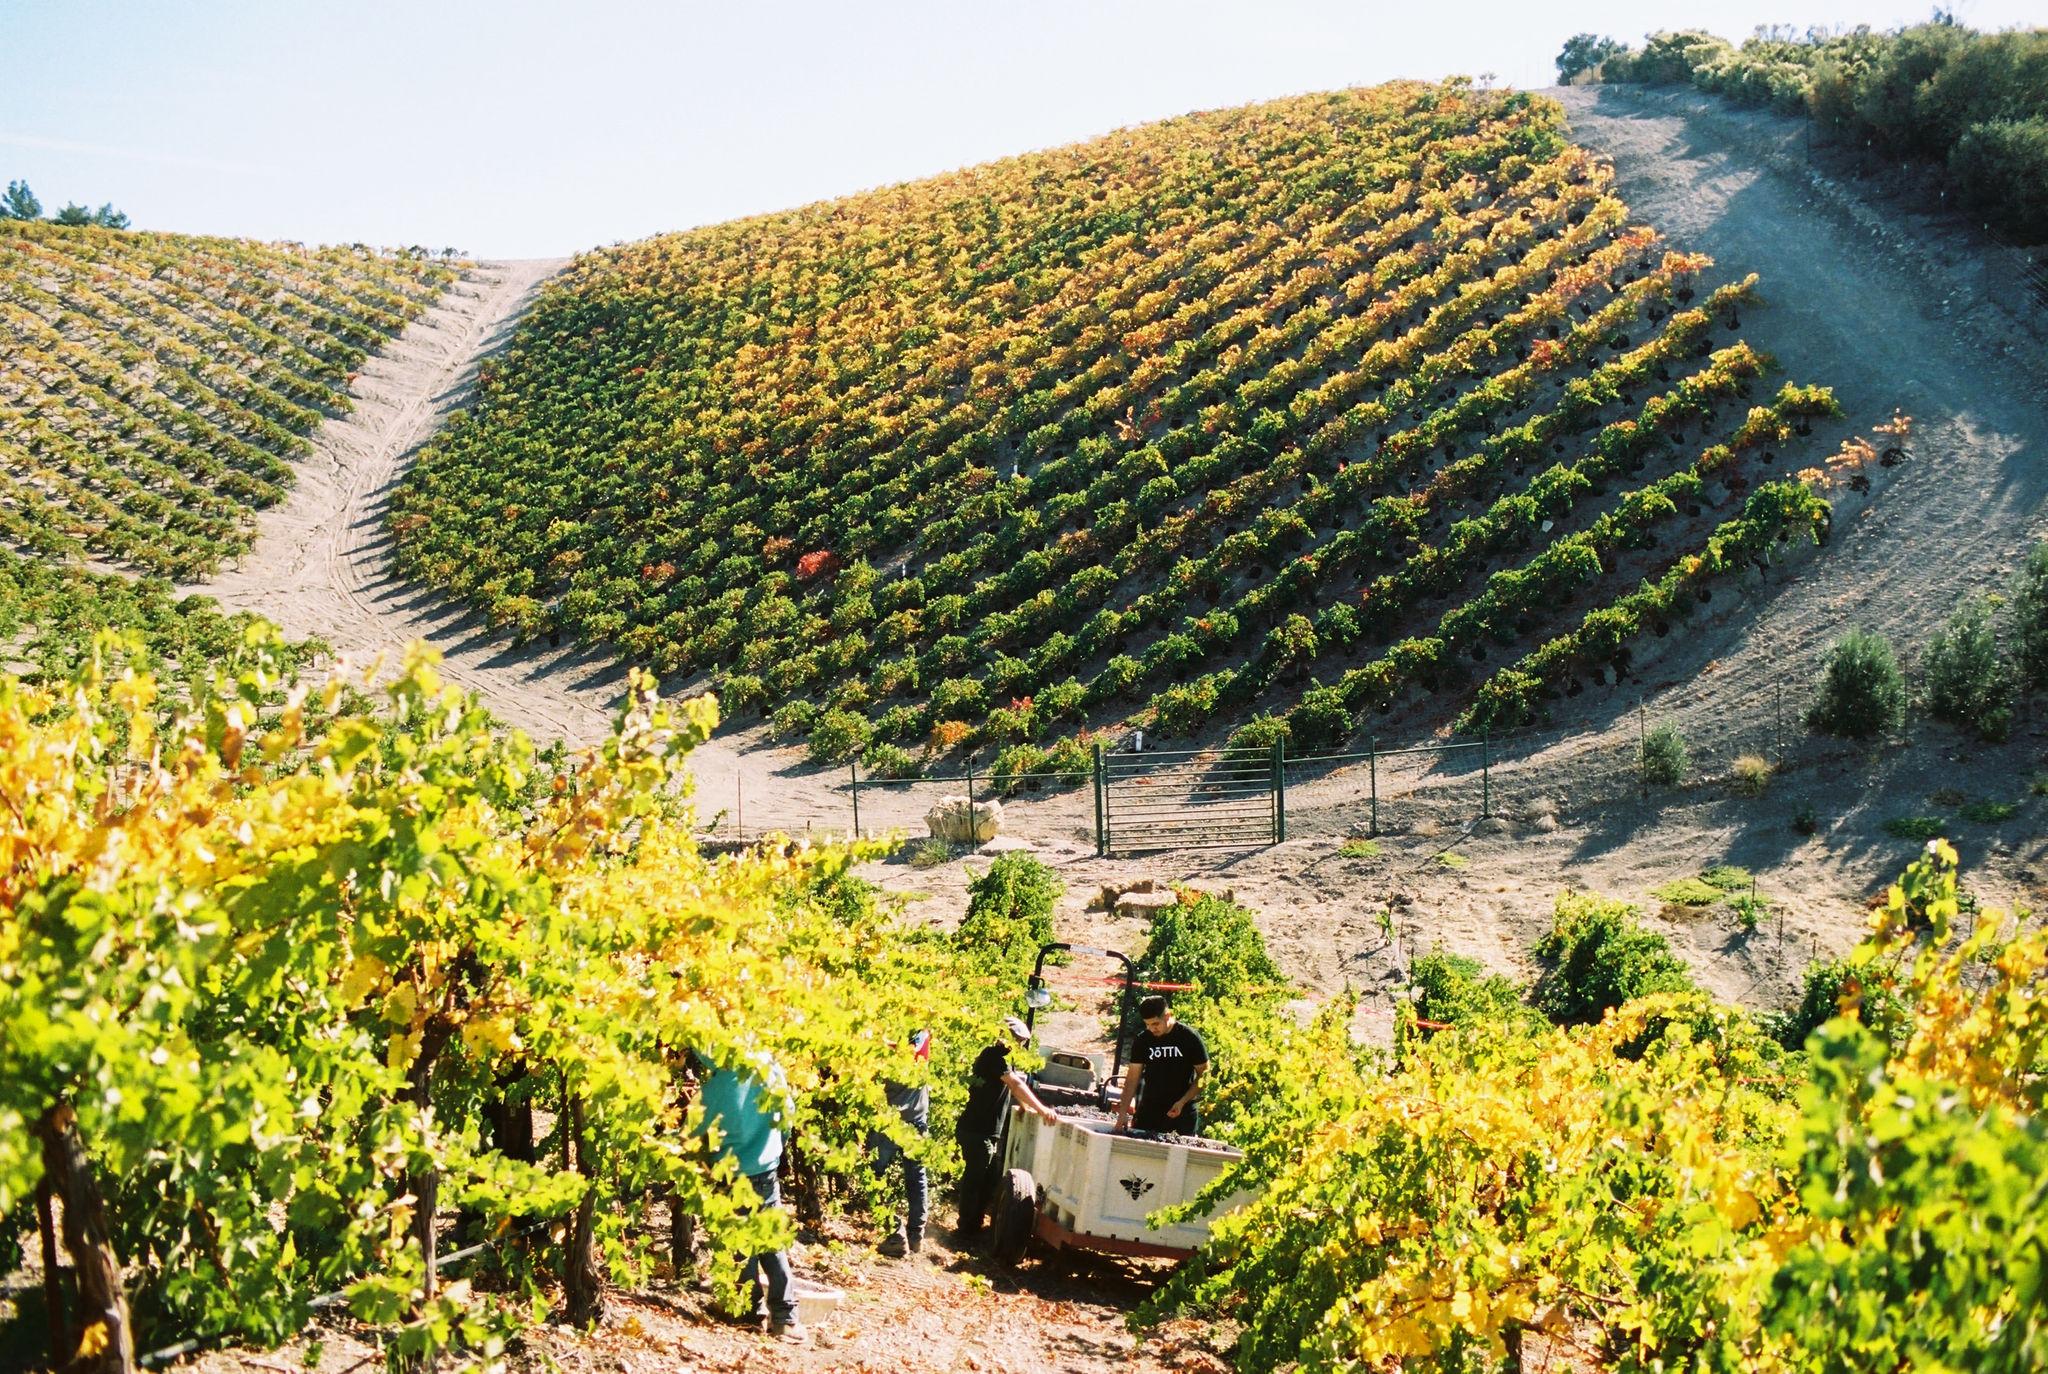 acacia_productions-halter_ranch-harvest-FILM-0081.jpg